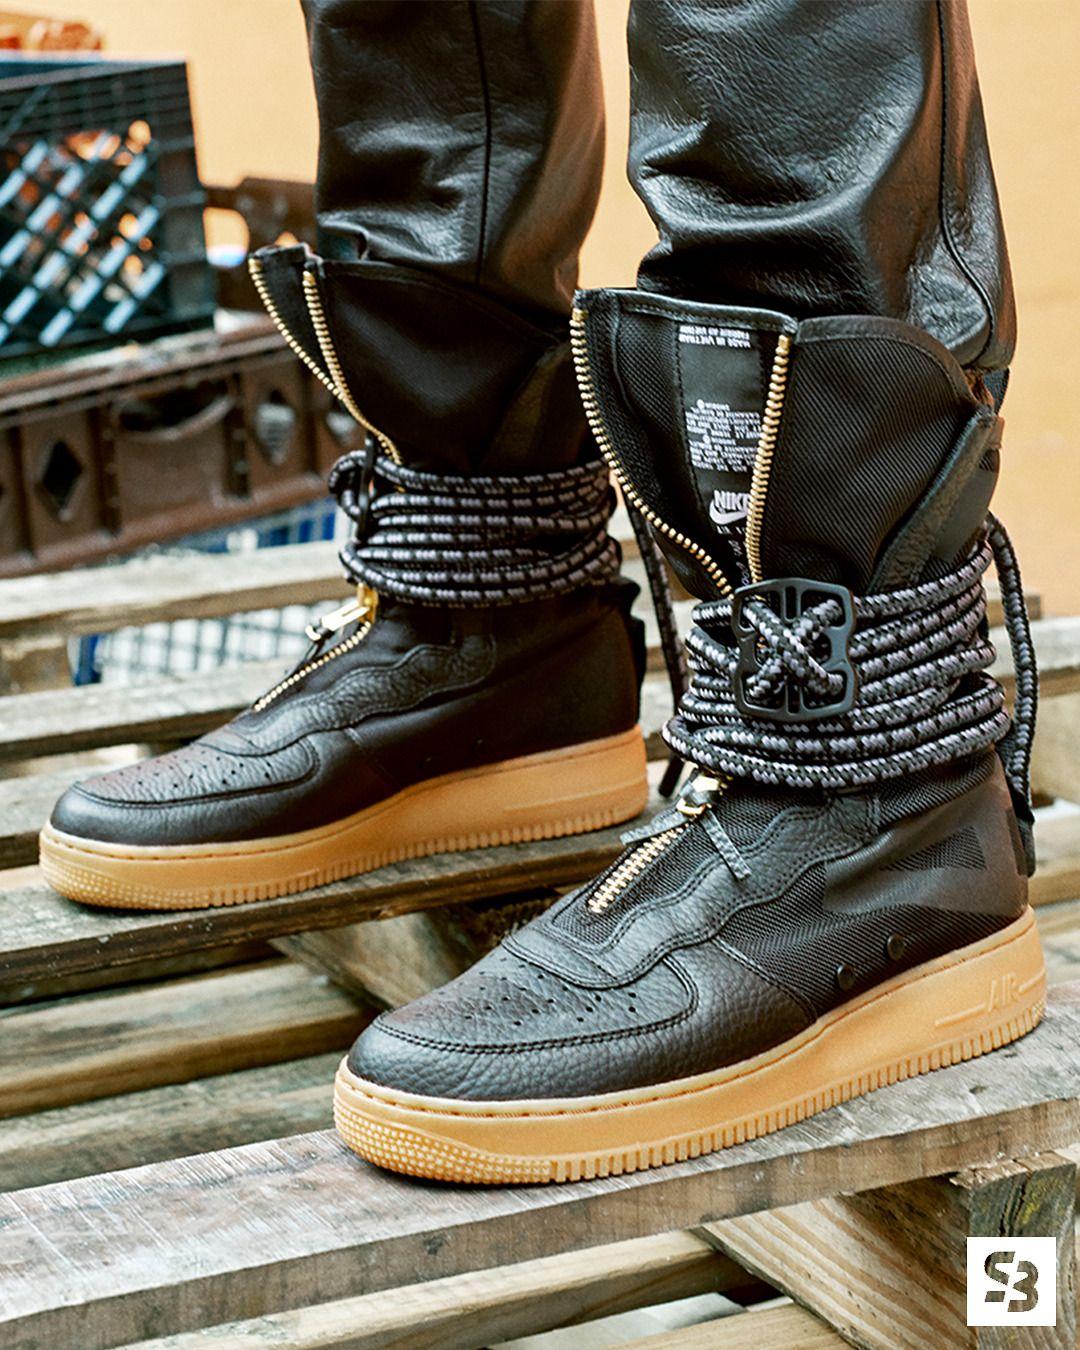 Nike Sf Af 1 High Sf By Blog Sneakerando Com Sneakers Sneakernews Streetstyle Kicks Adidas Nike Vans Newbala Sneakers Men Fashion Mens Fashion Shoes Nike Boots